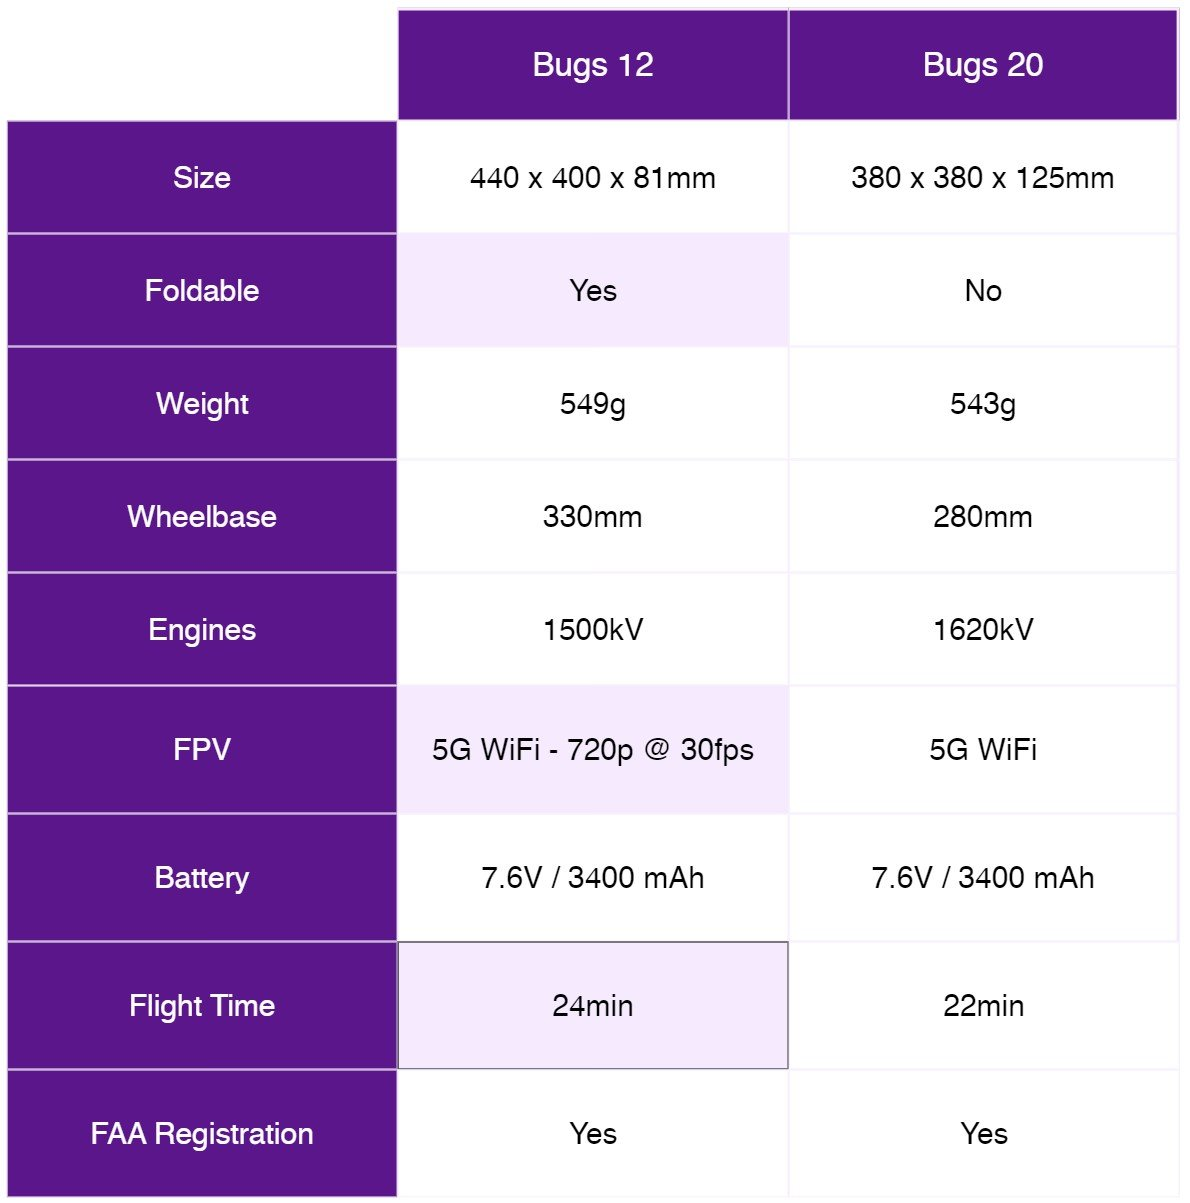 mjx bugs 12 vs bugs 20 specs table